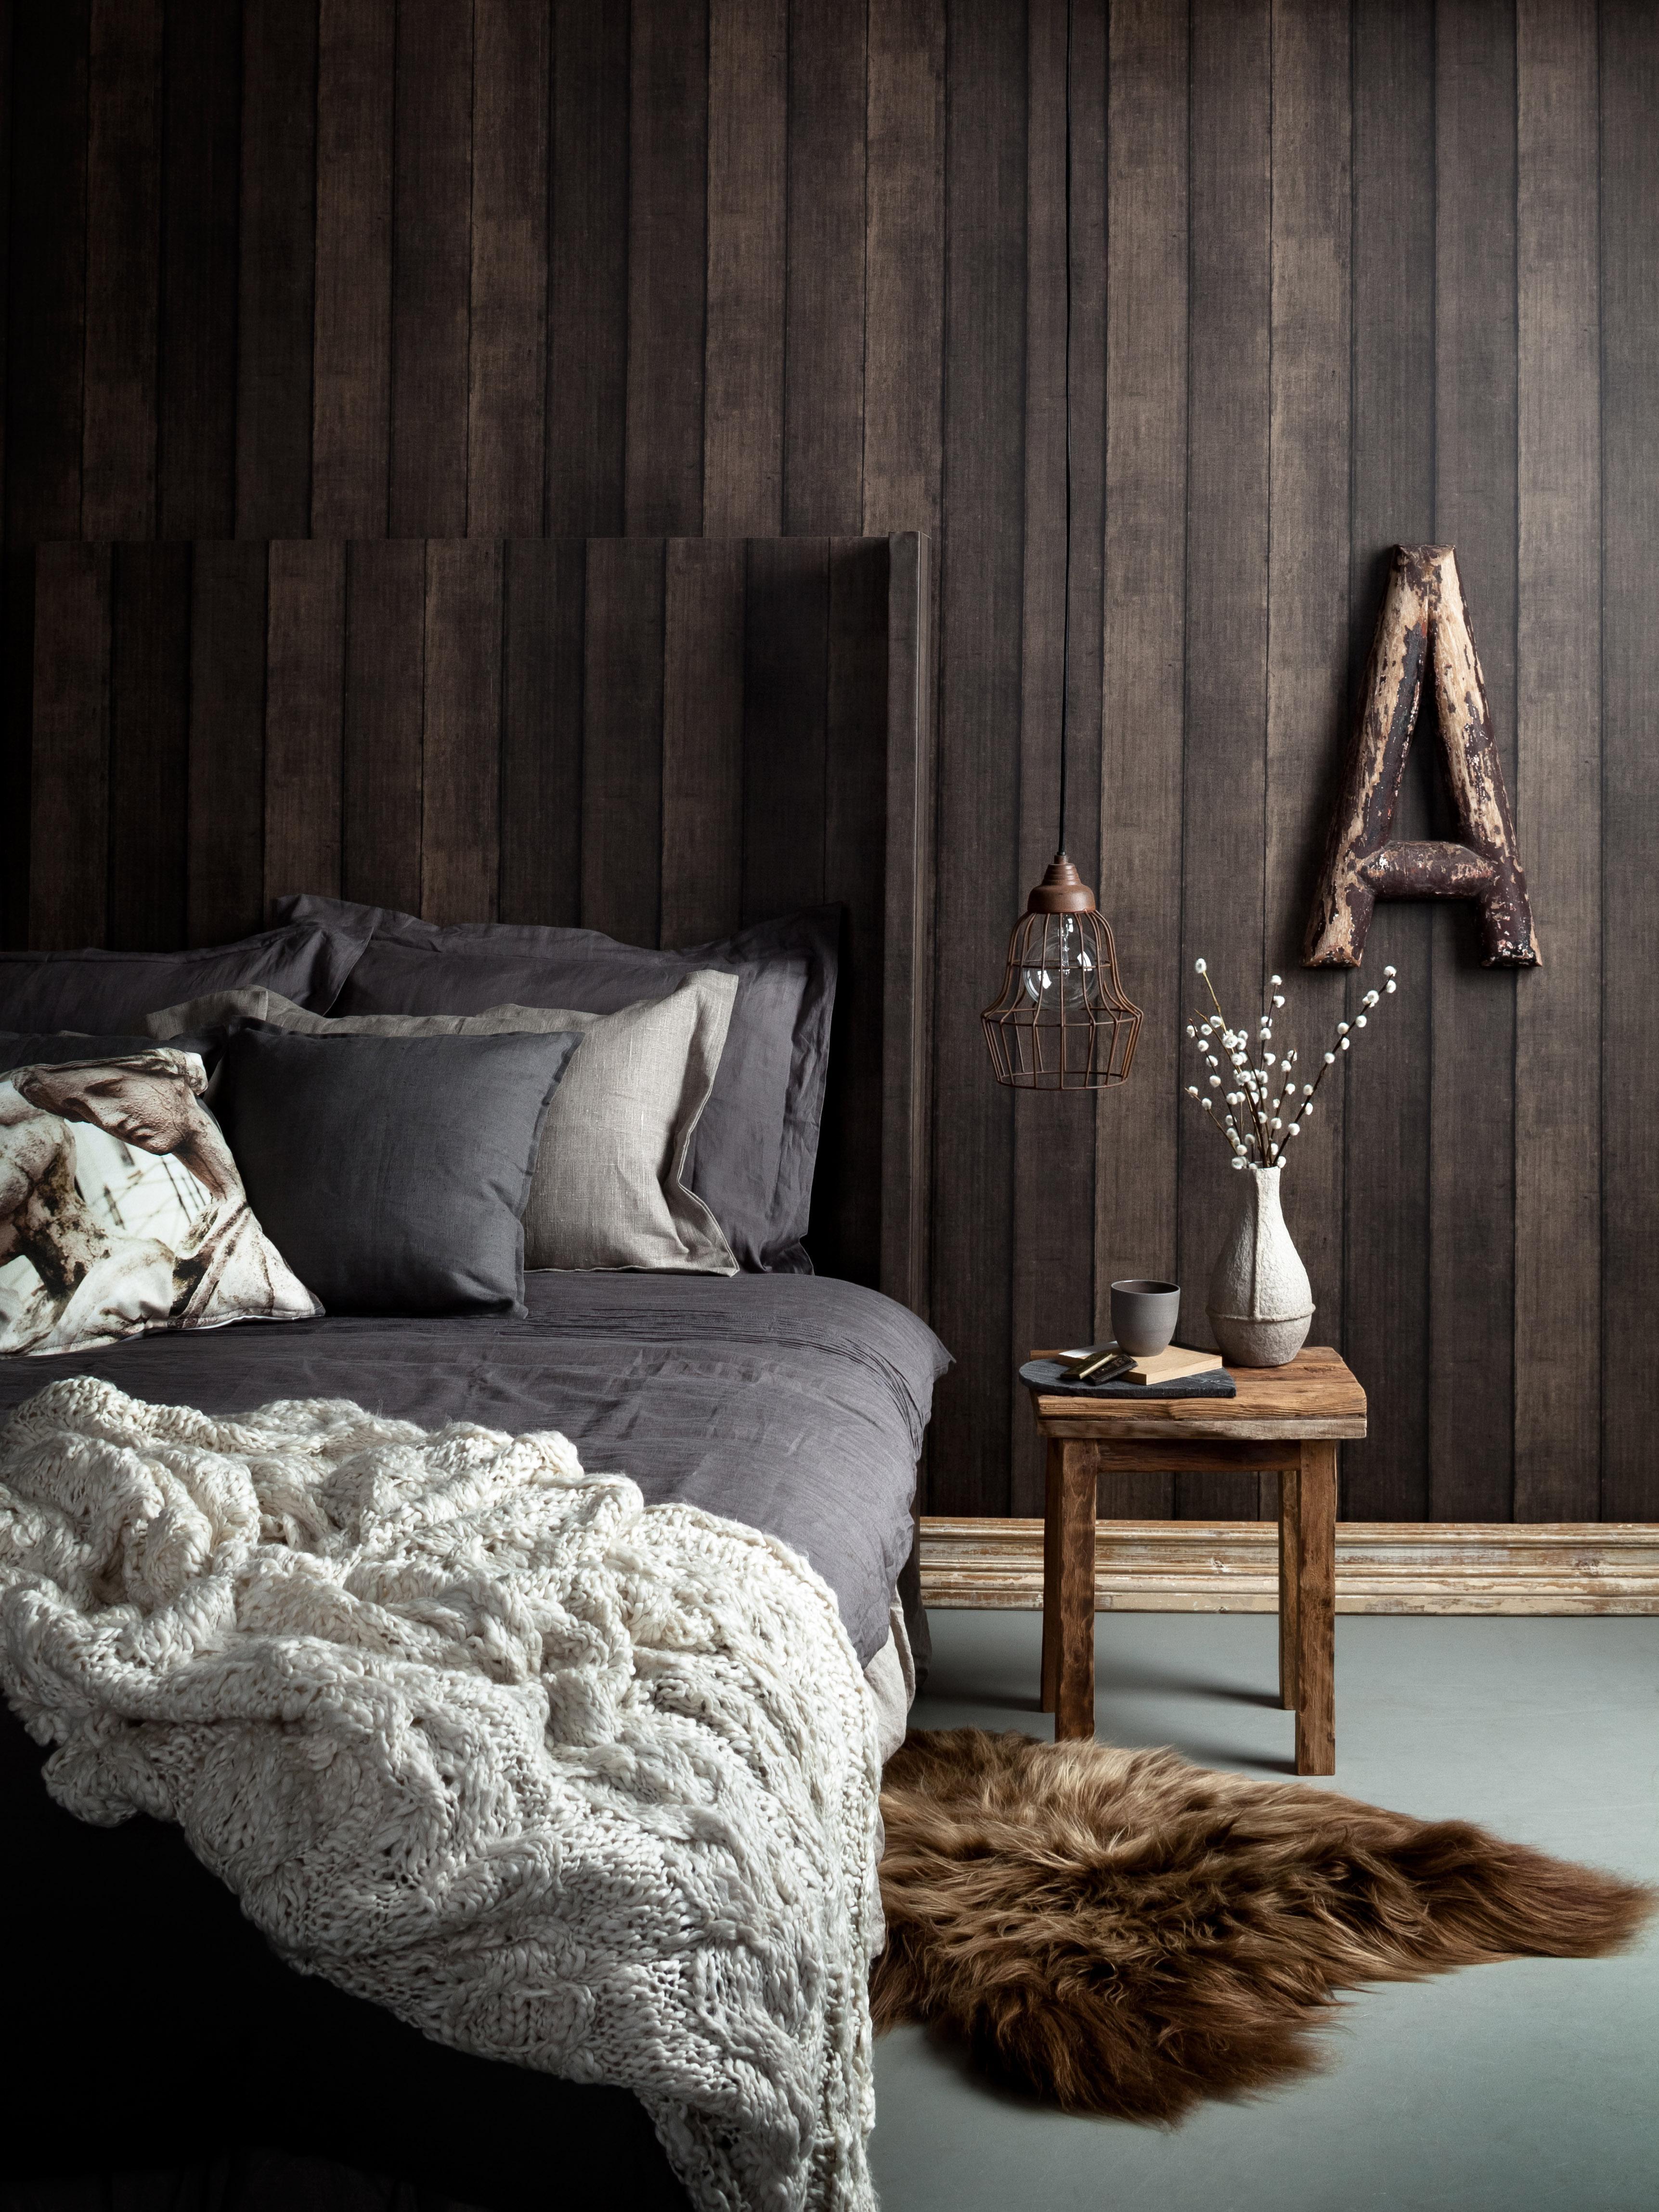 Holz tapete ideen  Tapete Holzoptik • Bilder & Ideen • COUCHstyle